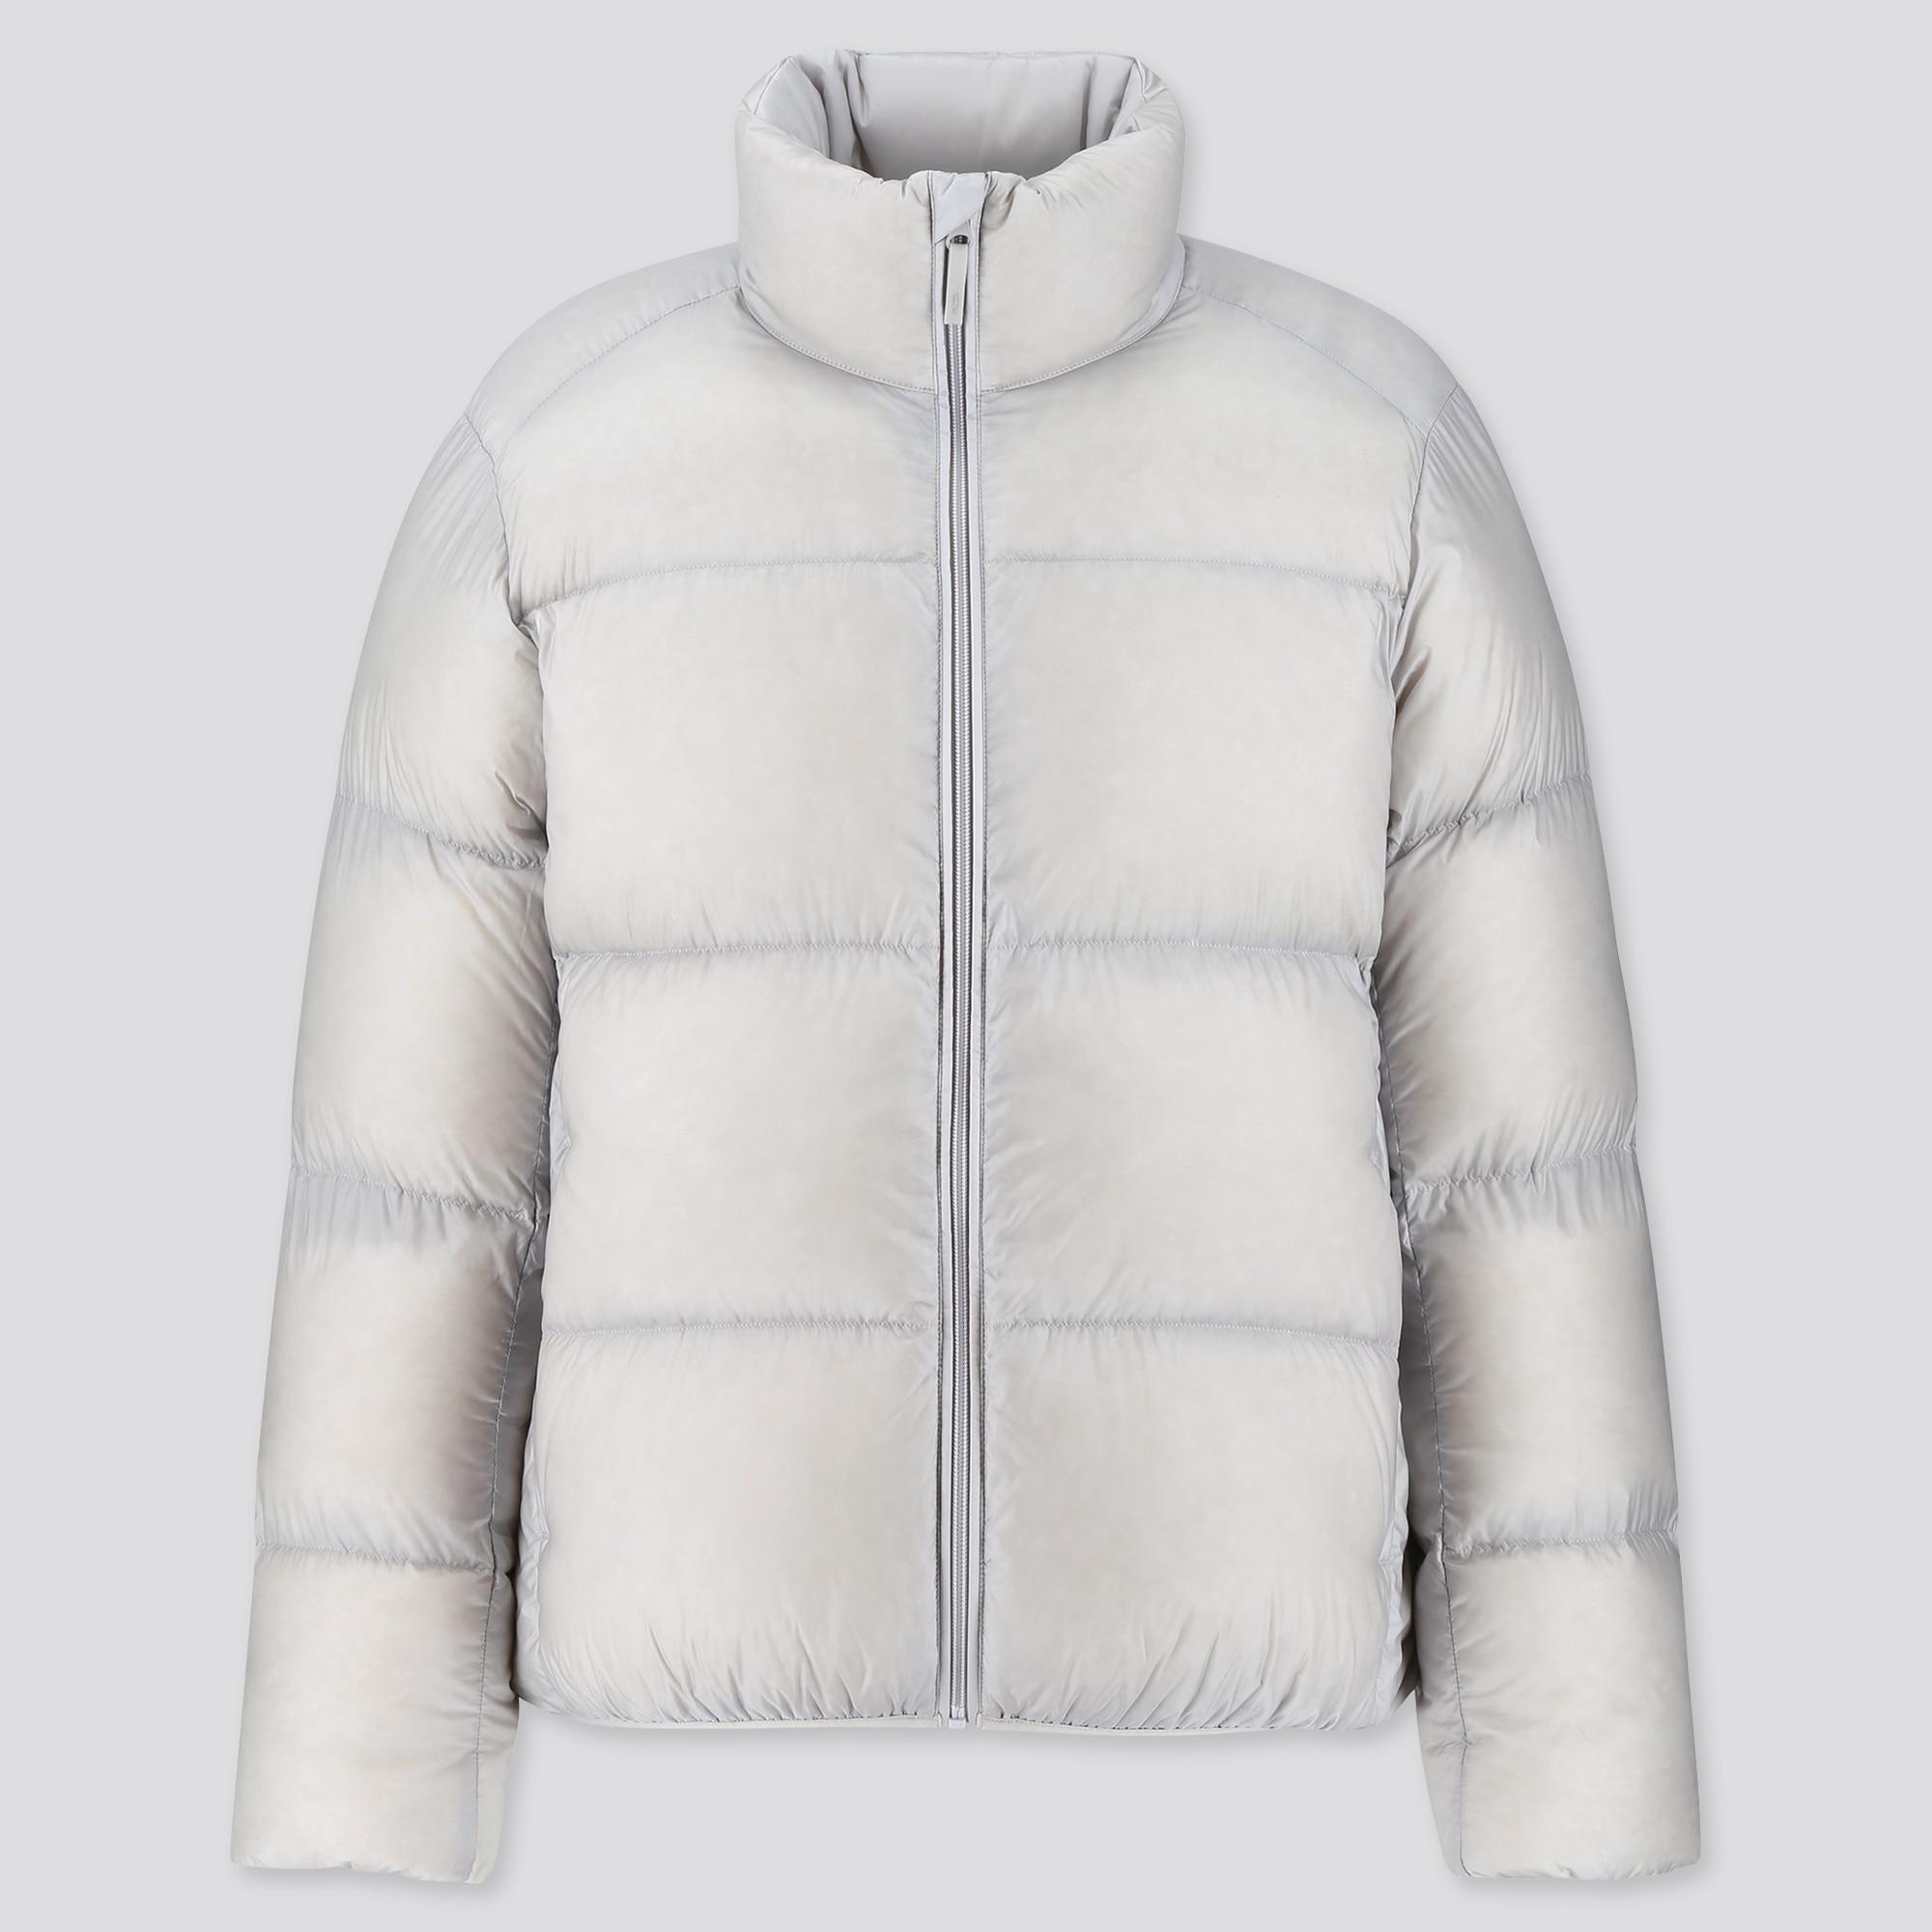 uniqlo puffer jacket